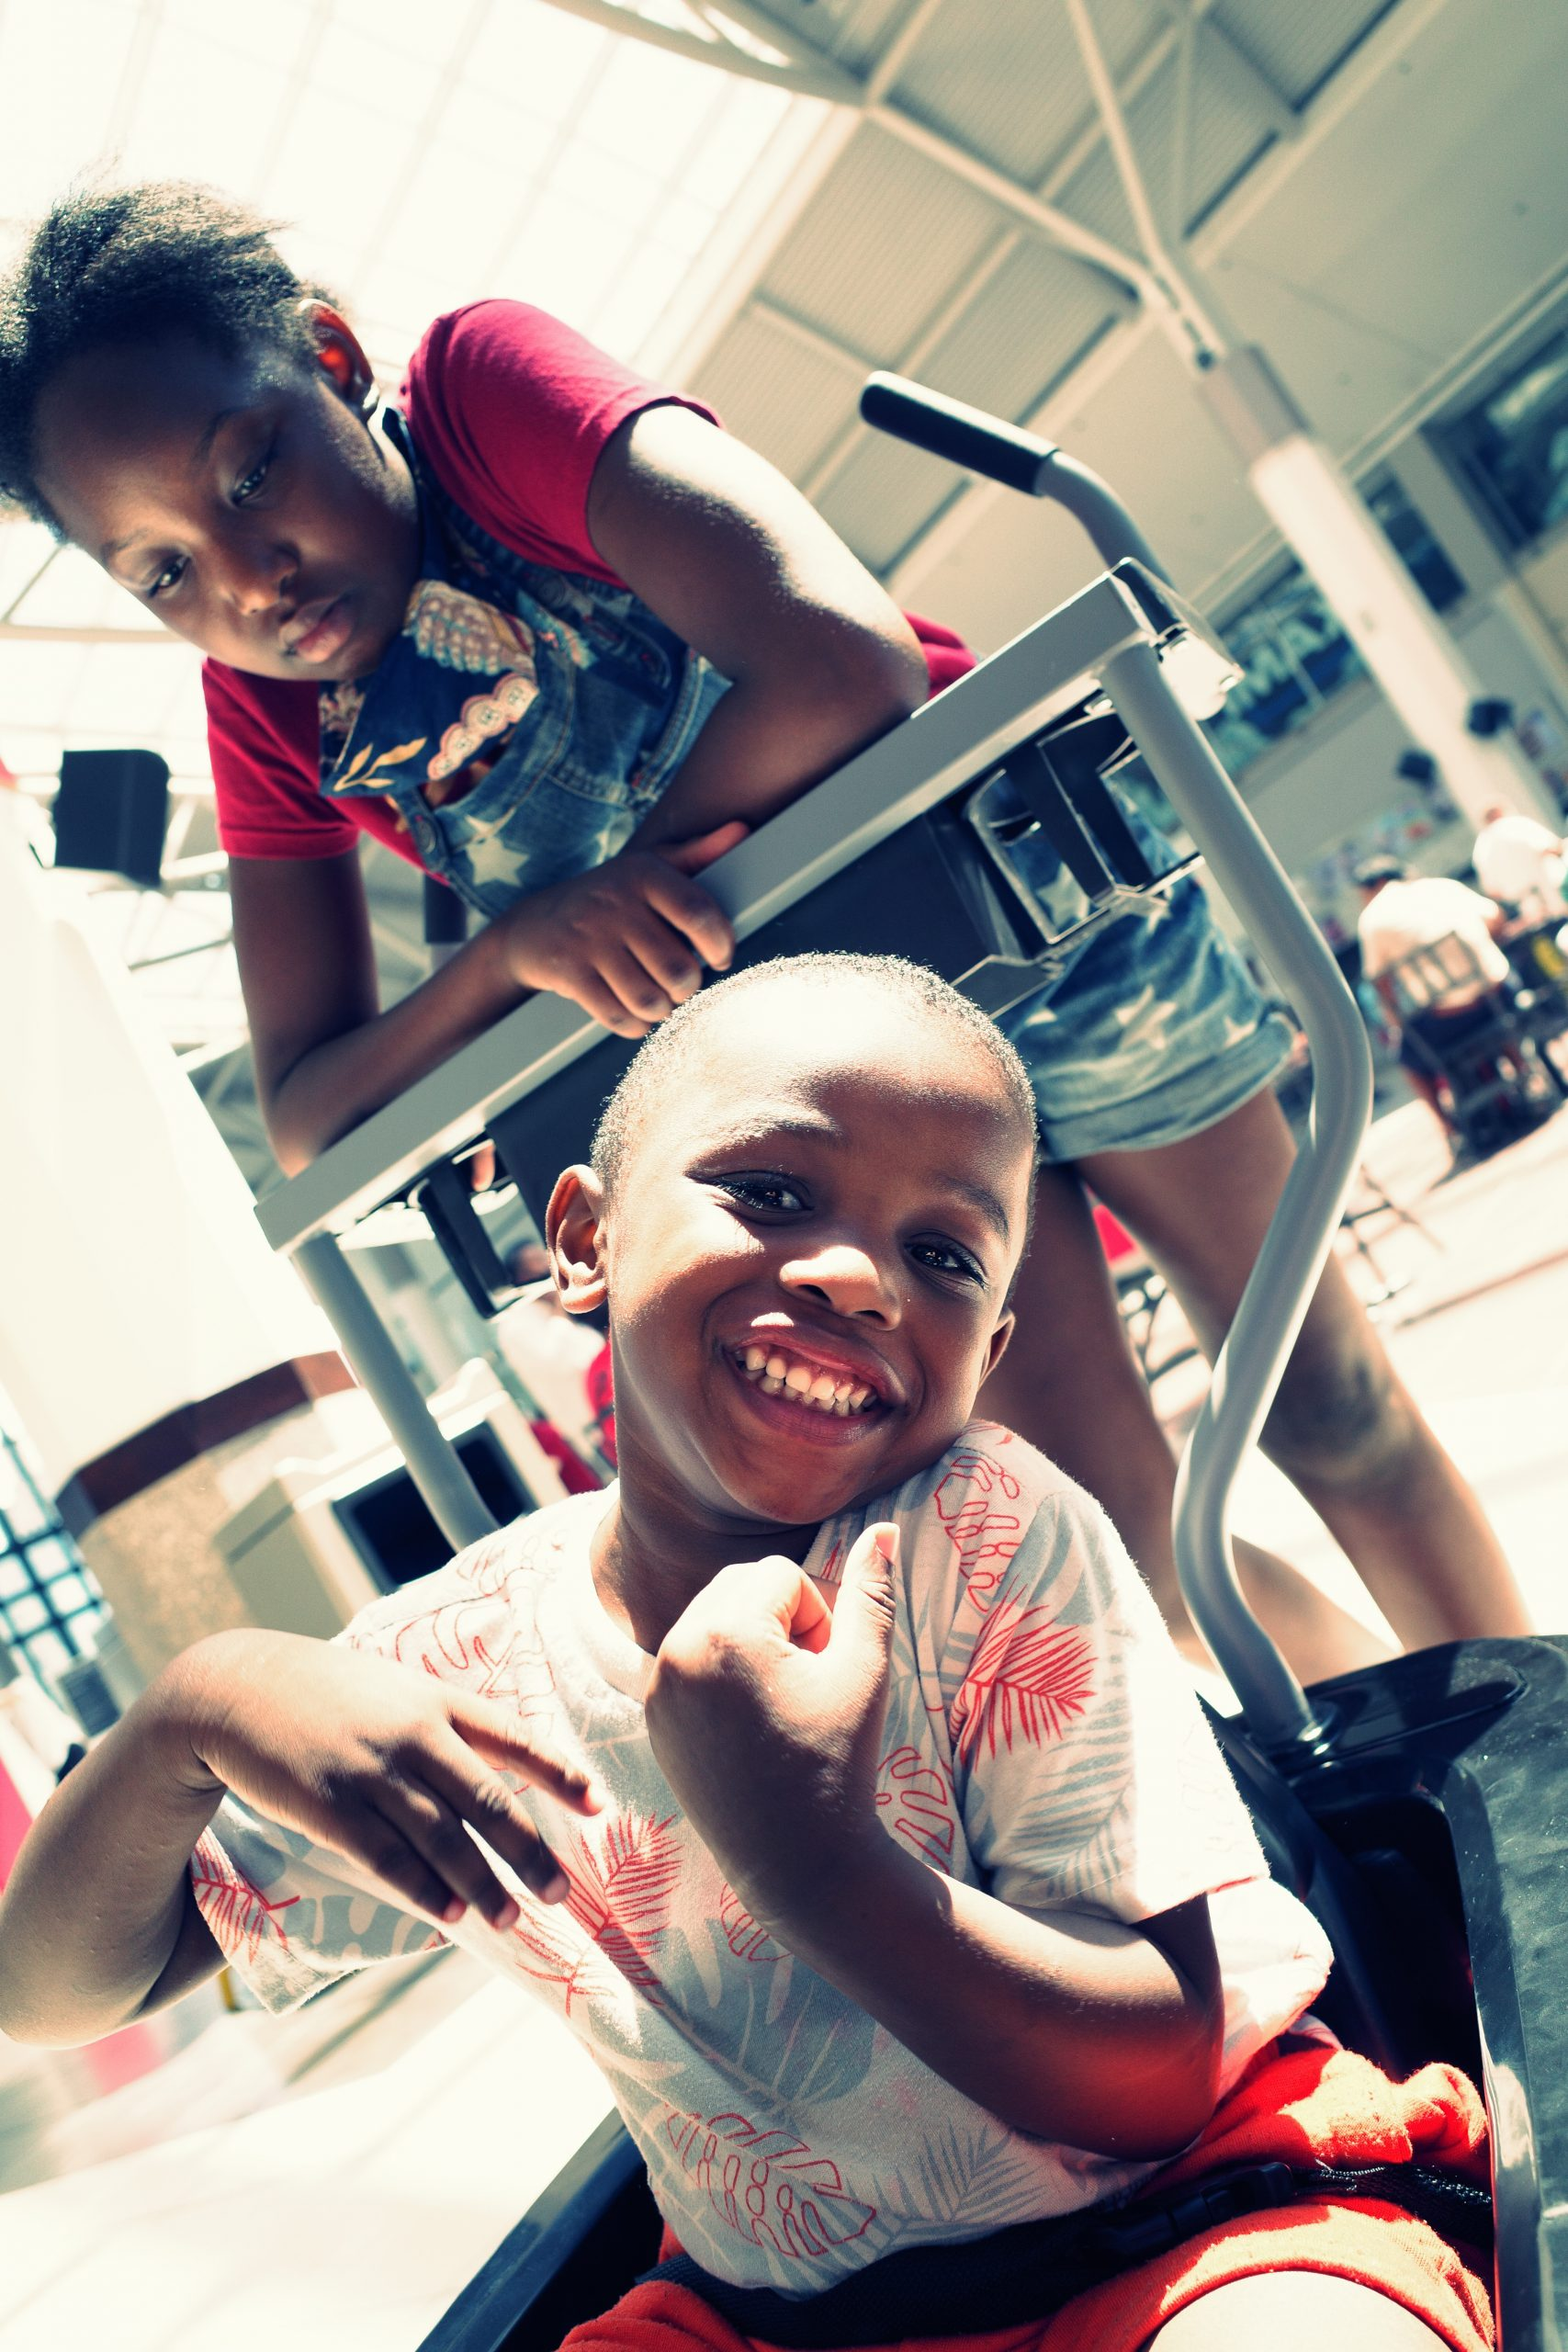 Laughing kids street photography mall ERIC KIM Ricoh GR iii